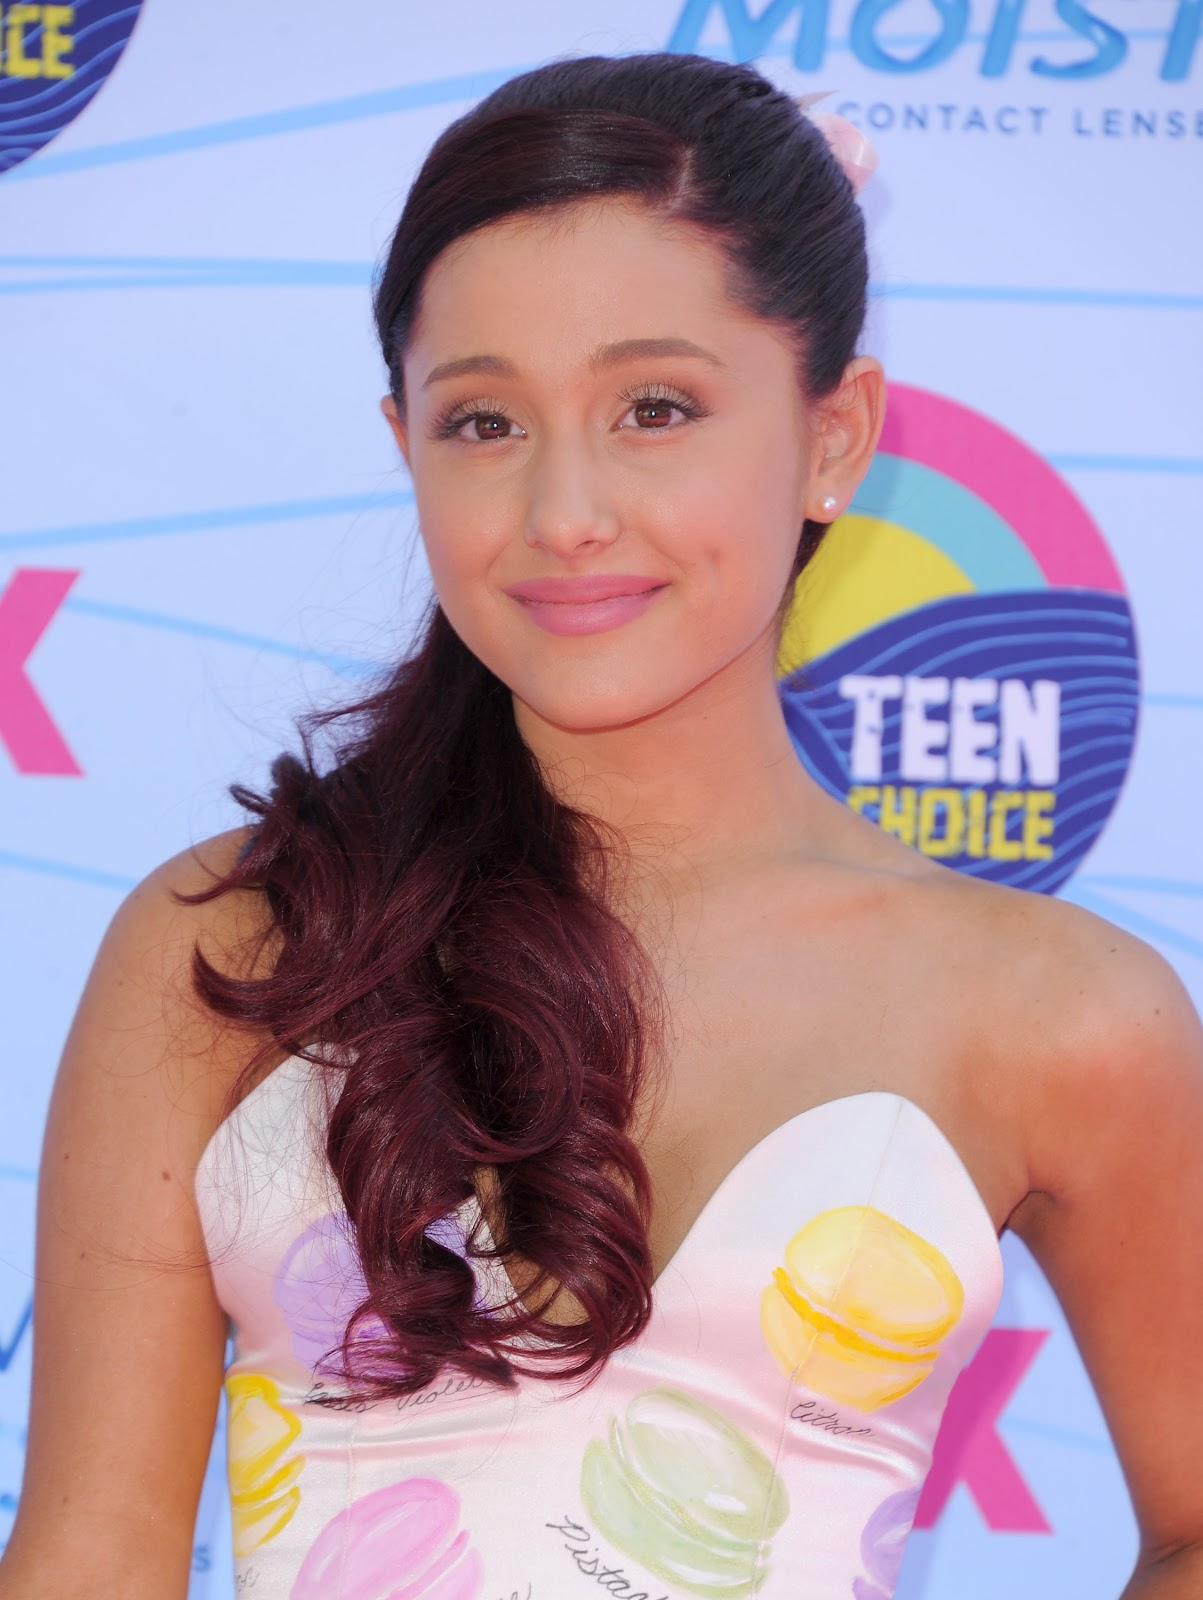 http://2.bp.blogspot.com/-h1ORWt5qHN4/UA0EGnRke_I/AAAAAAAAPG4/kveQ2SvTHLs/s1600/Ariana+Grande+Cleavage+at+the+14th+Annual+Teen+Choice+Awards+in+Universal+City+July+22,+2012+3.jpg